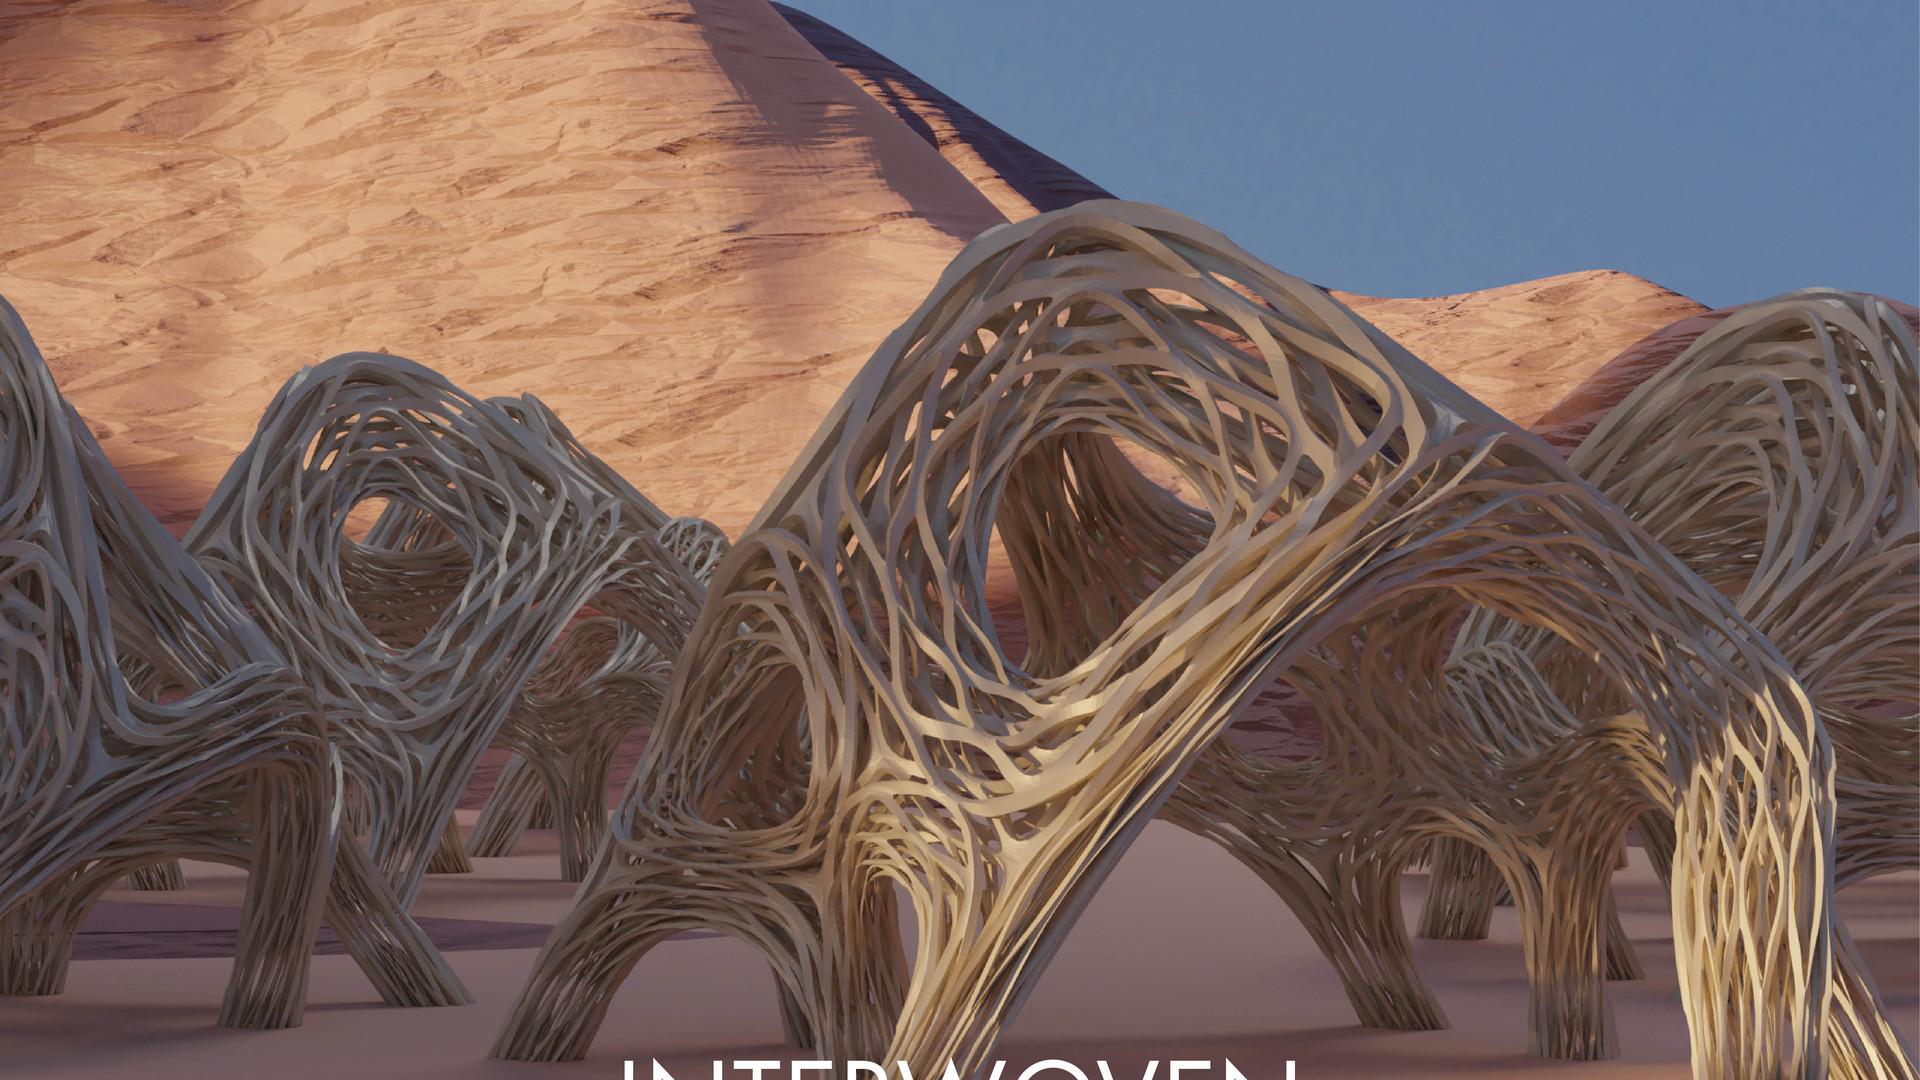 interwovenstructures_sa_400x4002.jpg